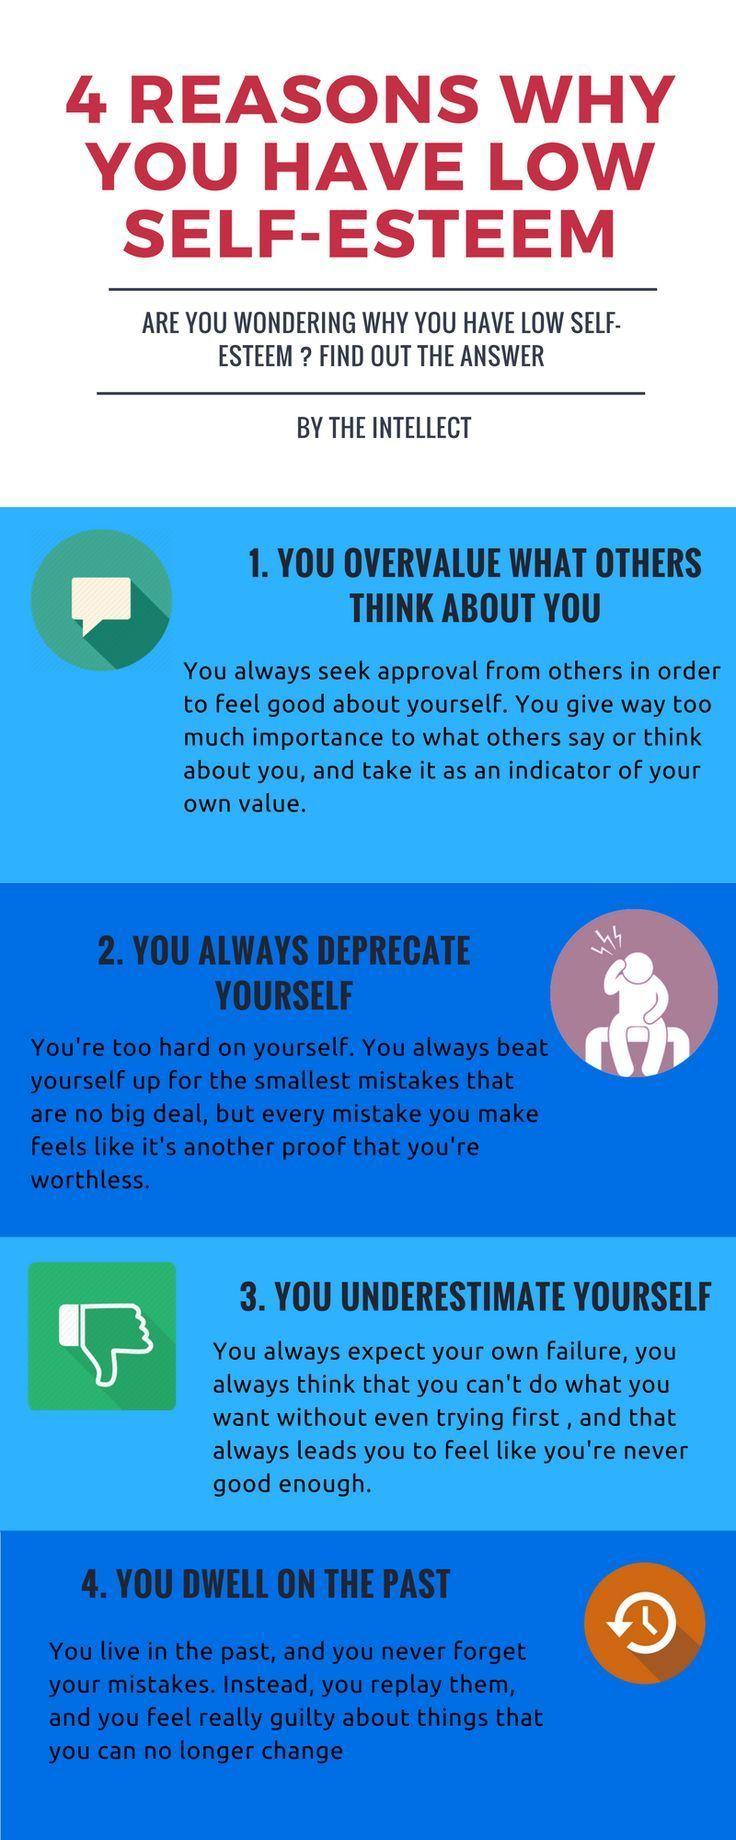 Infographic 4 Reasons Why You Have Low Self Esteem Self Esteem Activities Self Confidence Tips Building Self Esteem